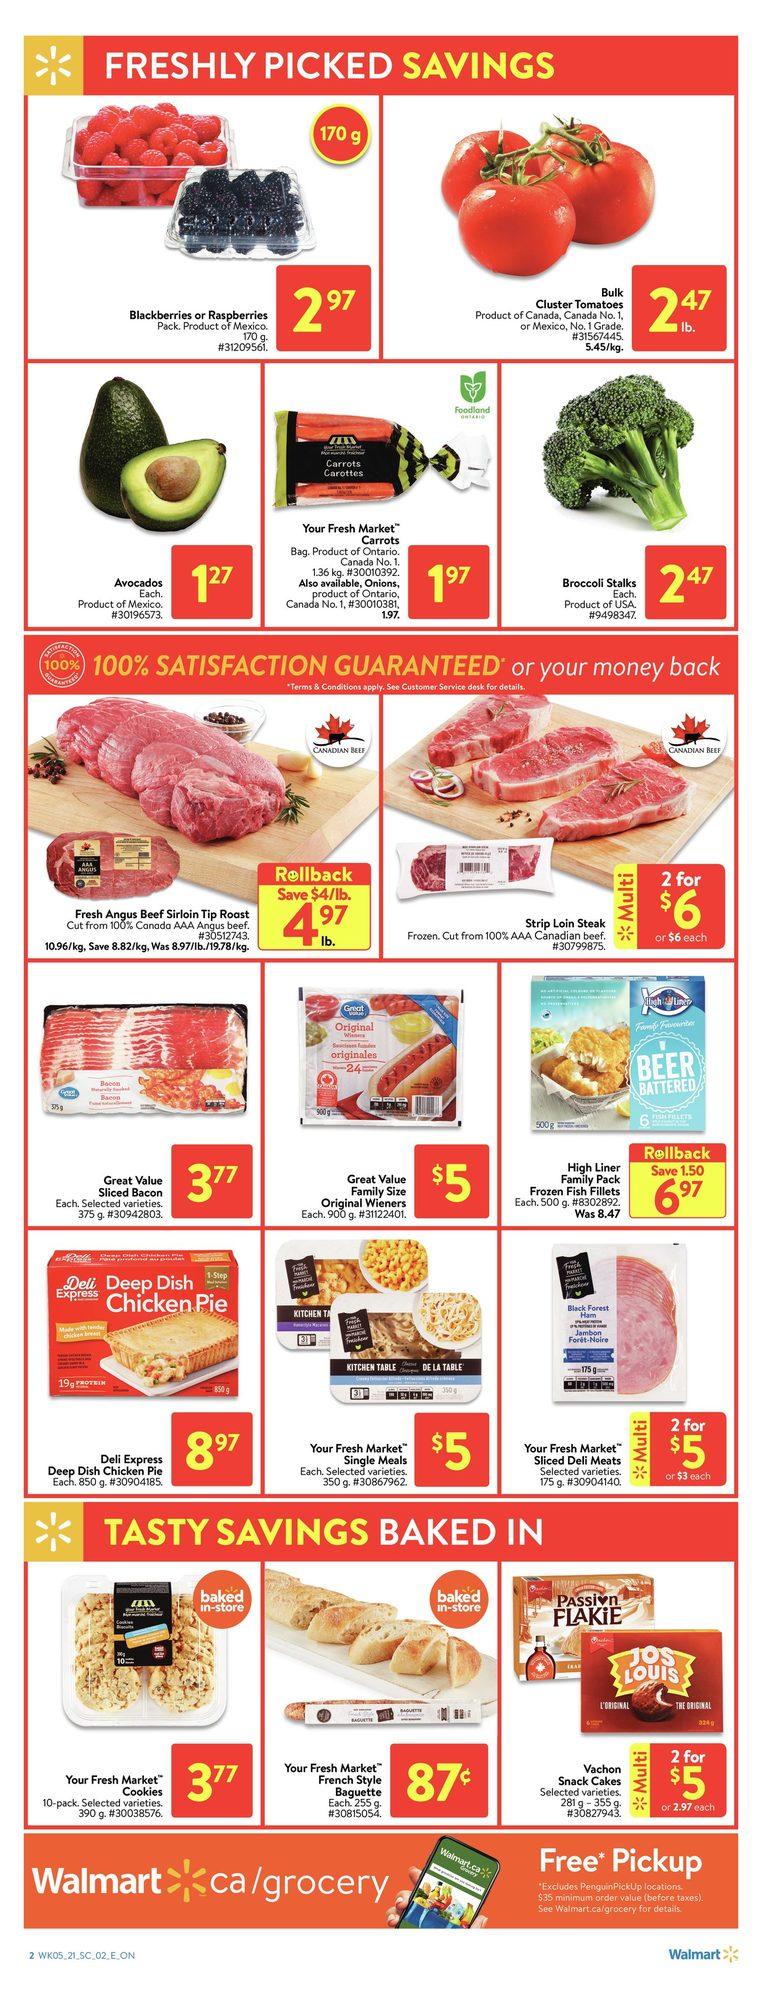 Walmart - Weekly Flyer Specials - Page 2